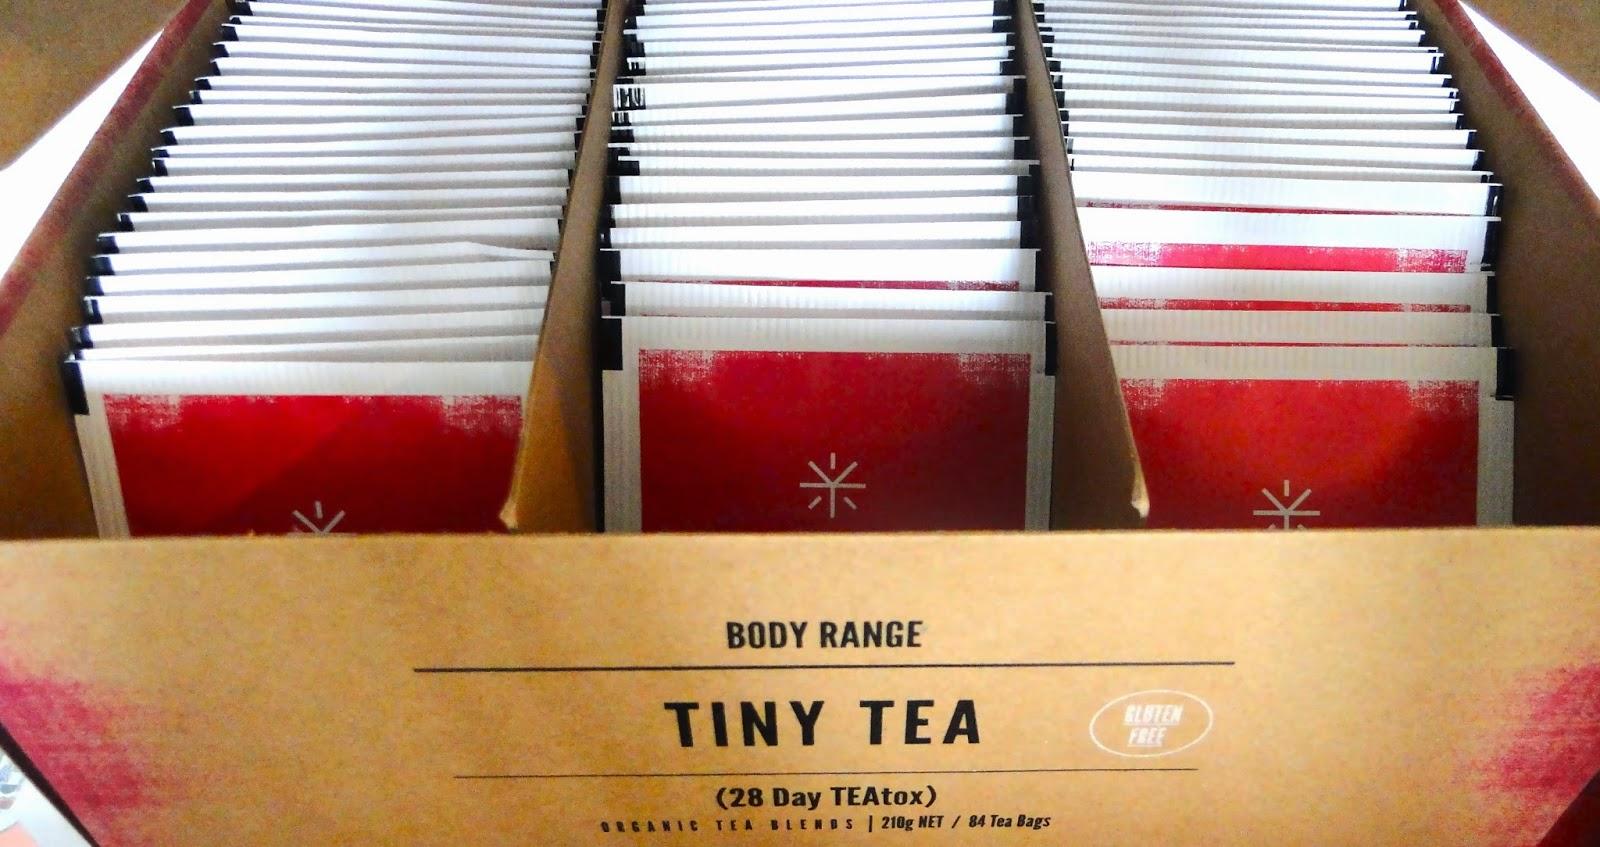 Tiny Tea, B Slim, Thé minceur, Régime, Maigrir, Your Tea,